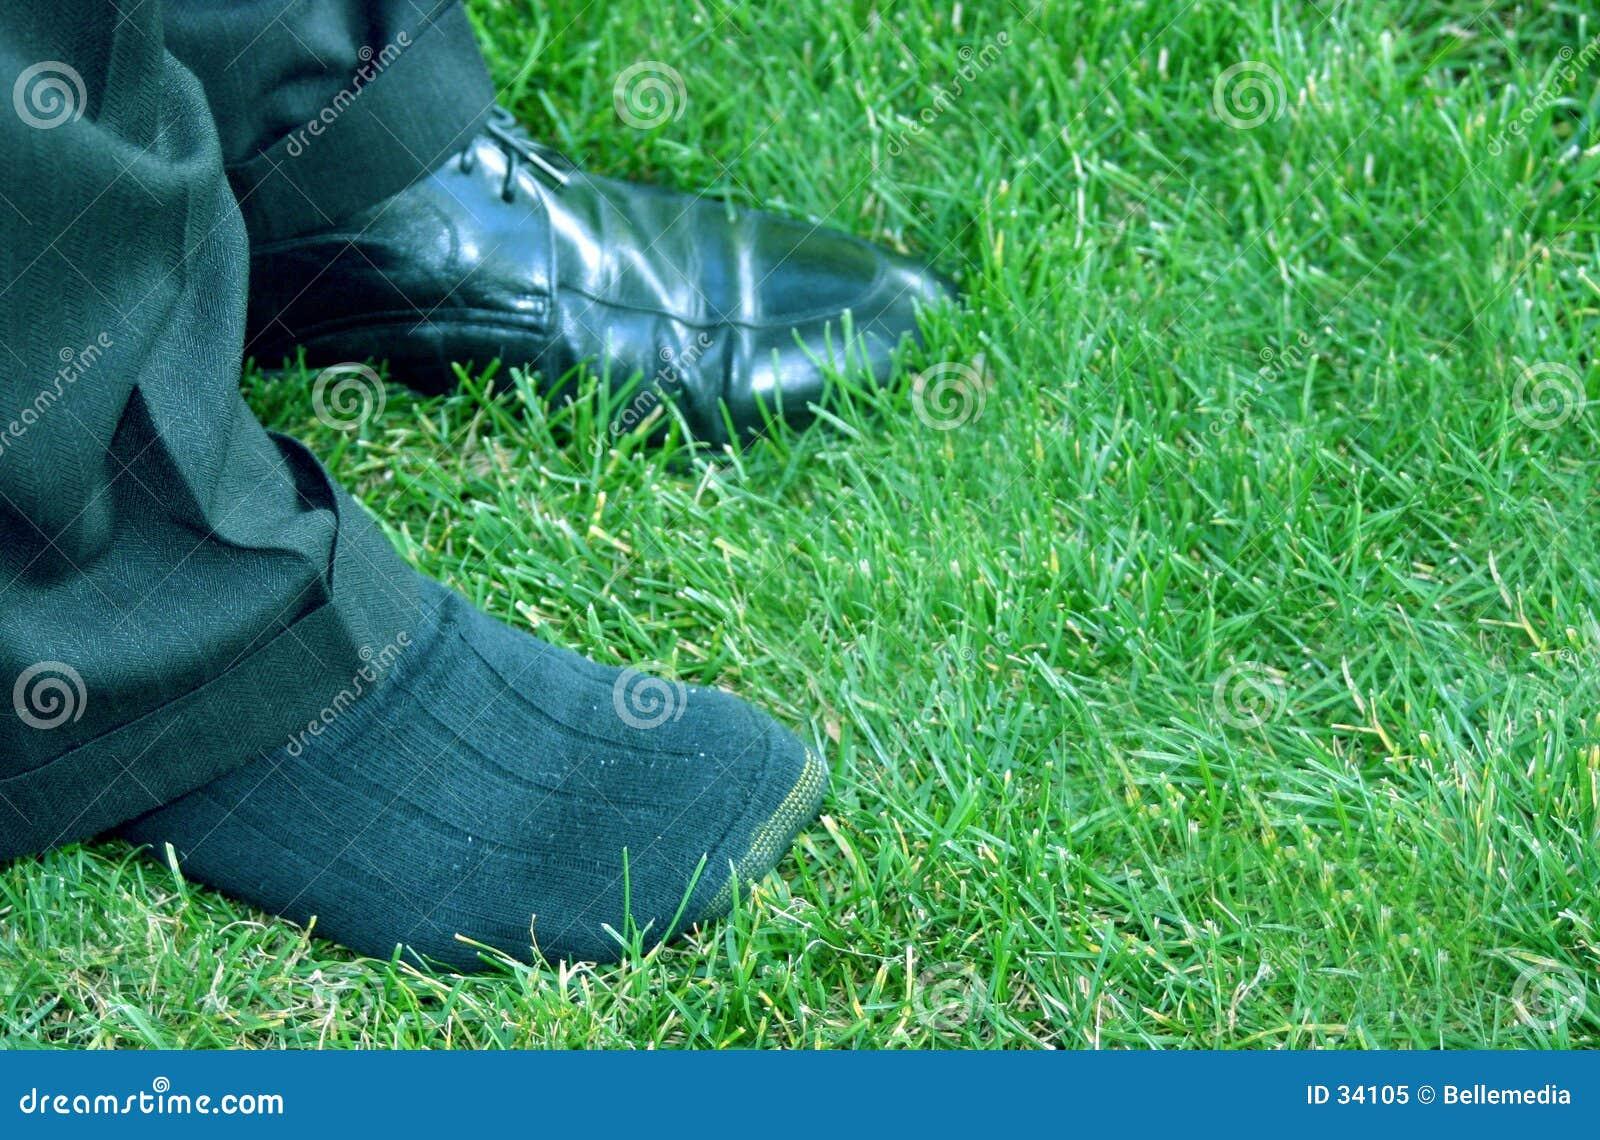 Sapata no outro pé